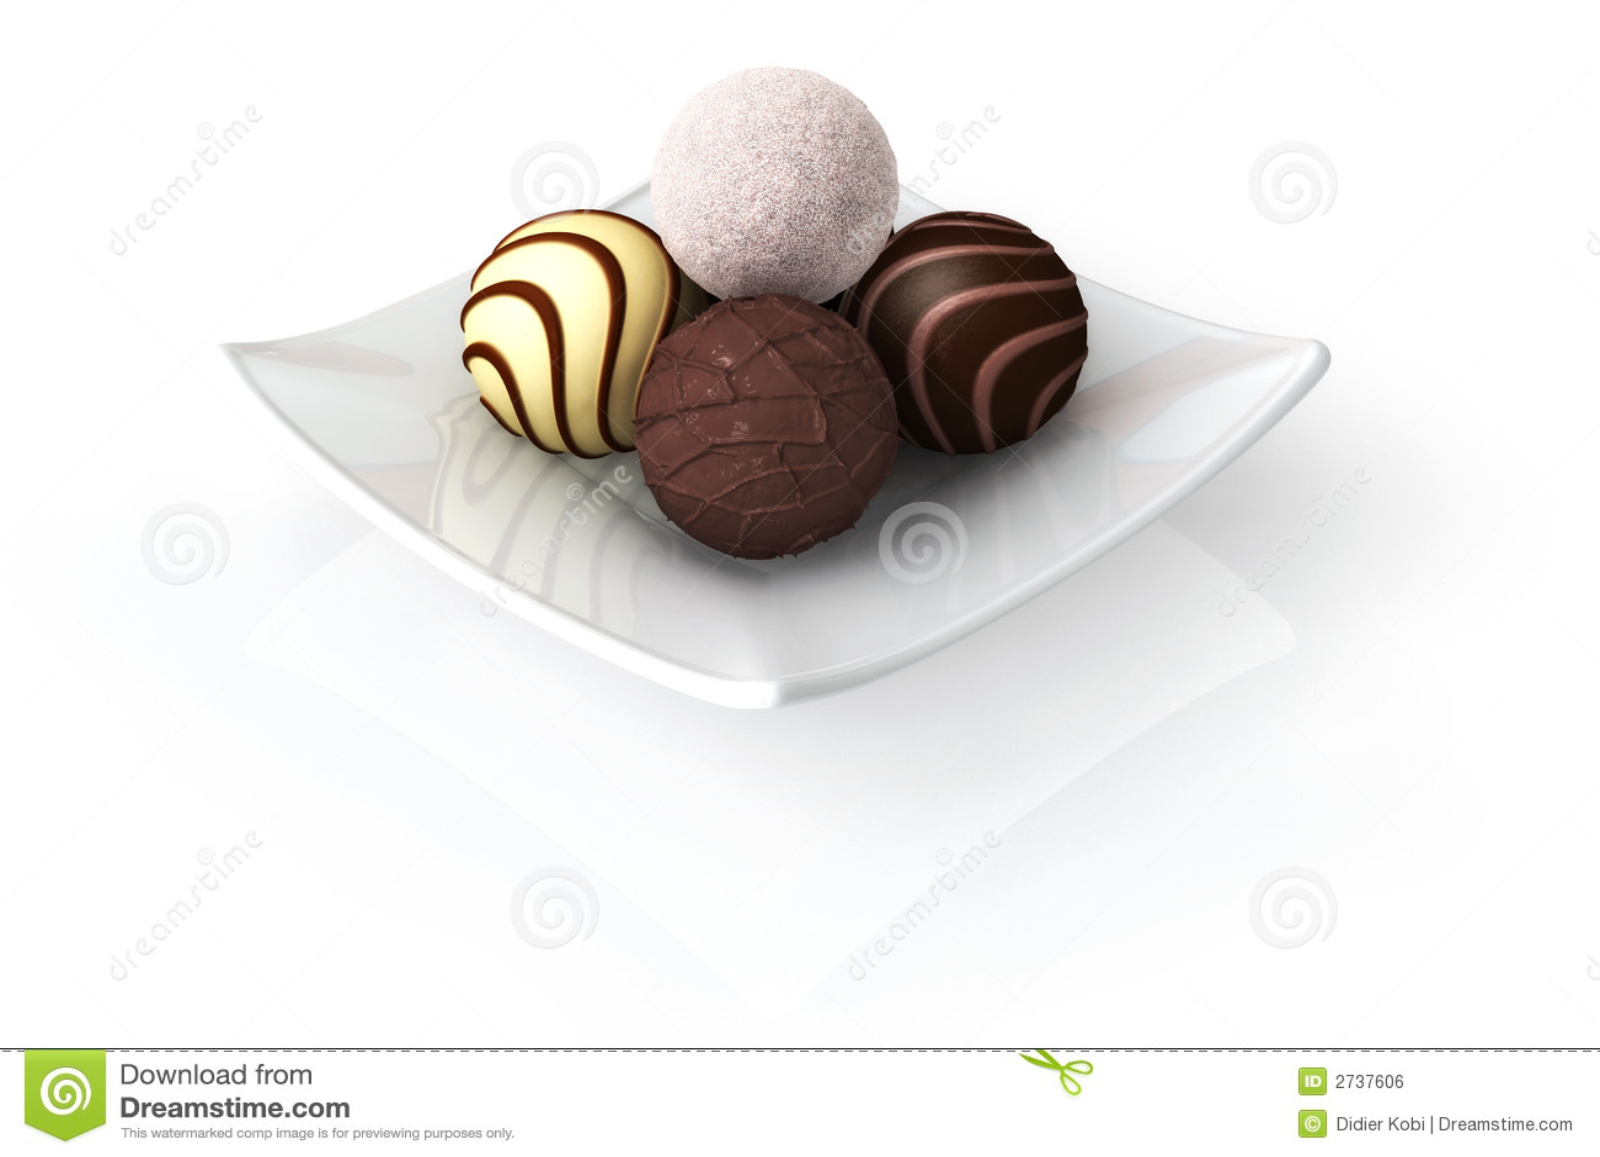 Chocolate on White